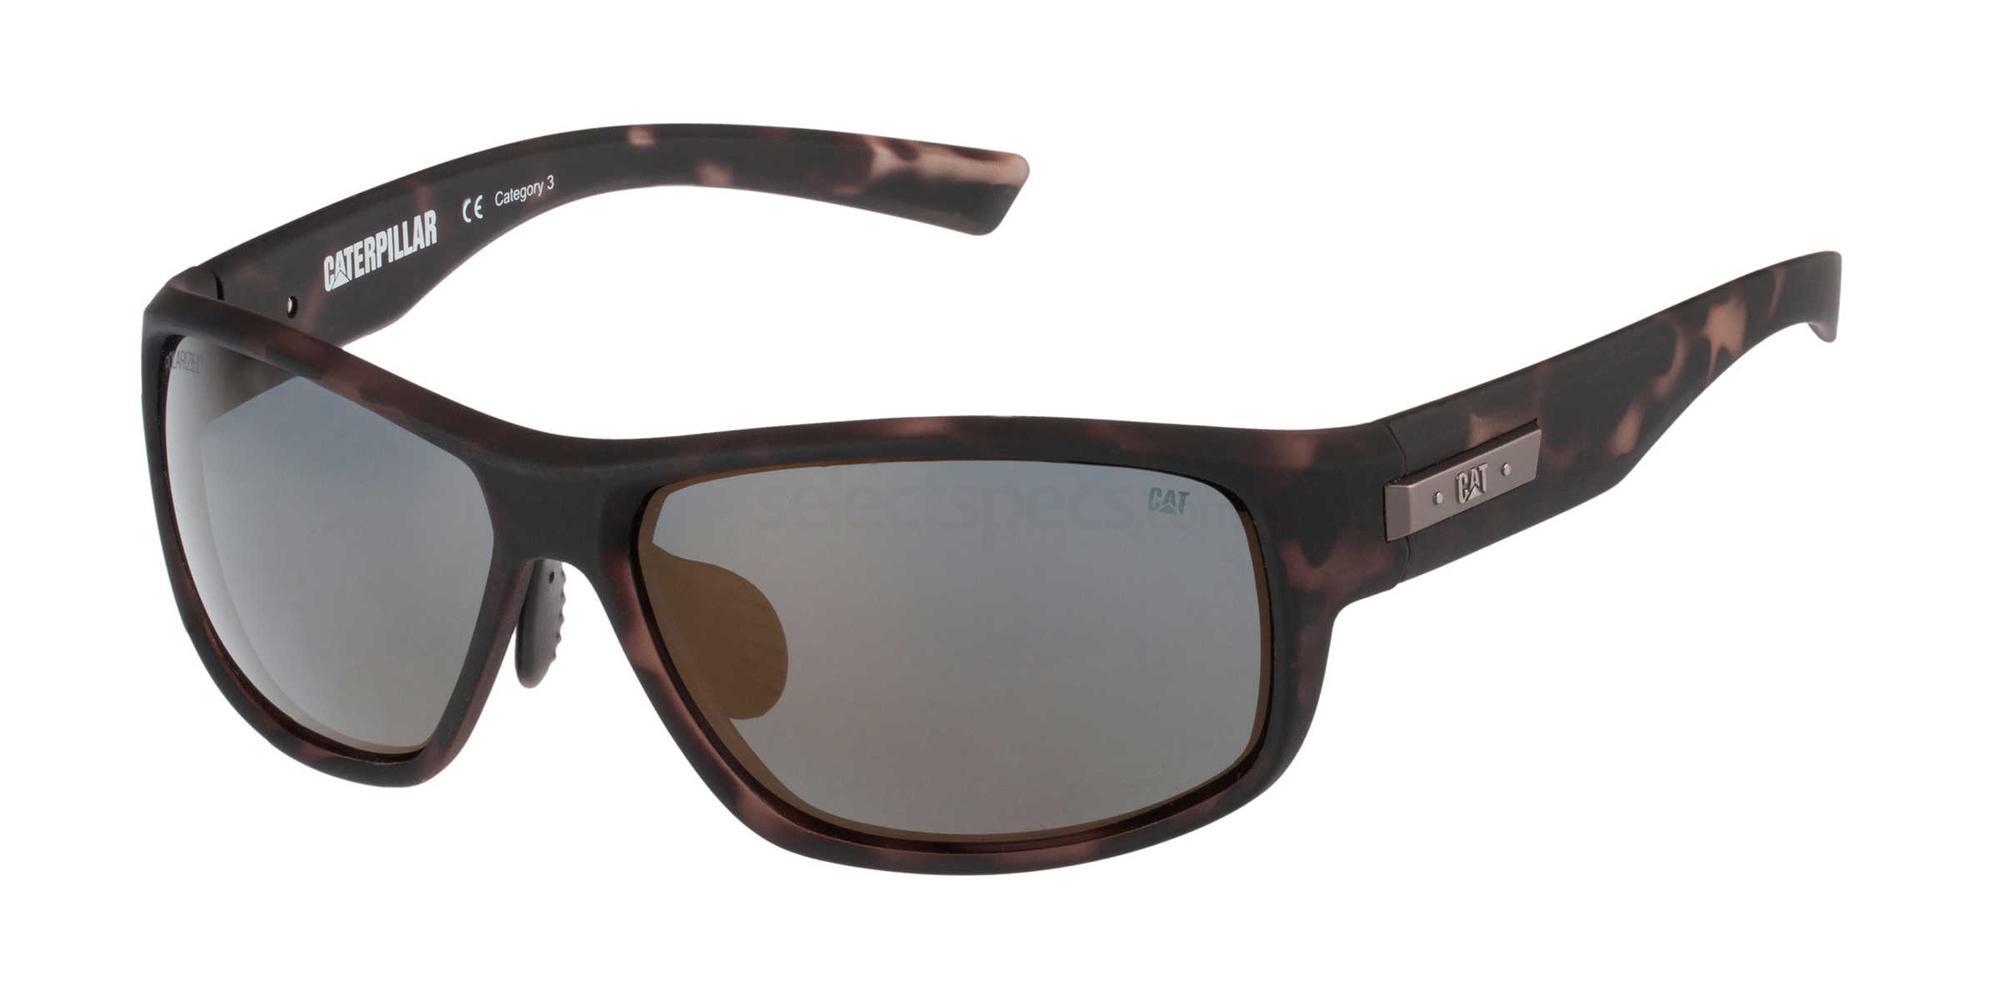 102P CTS-16004-P Sunglasses, CAT